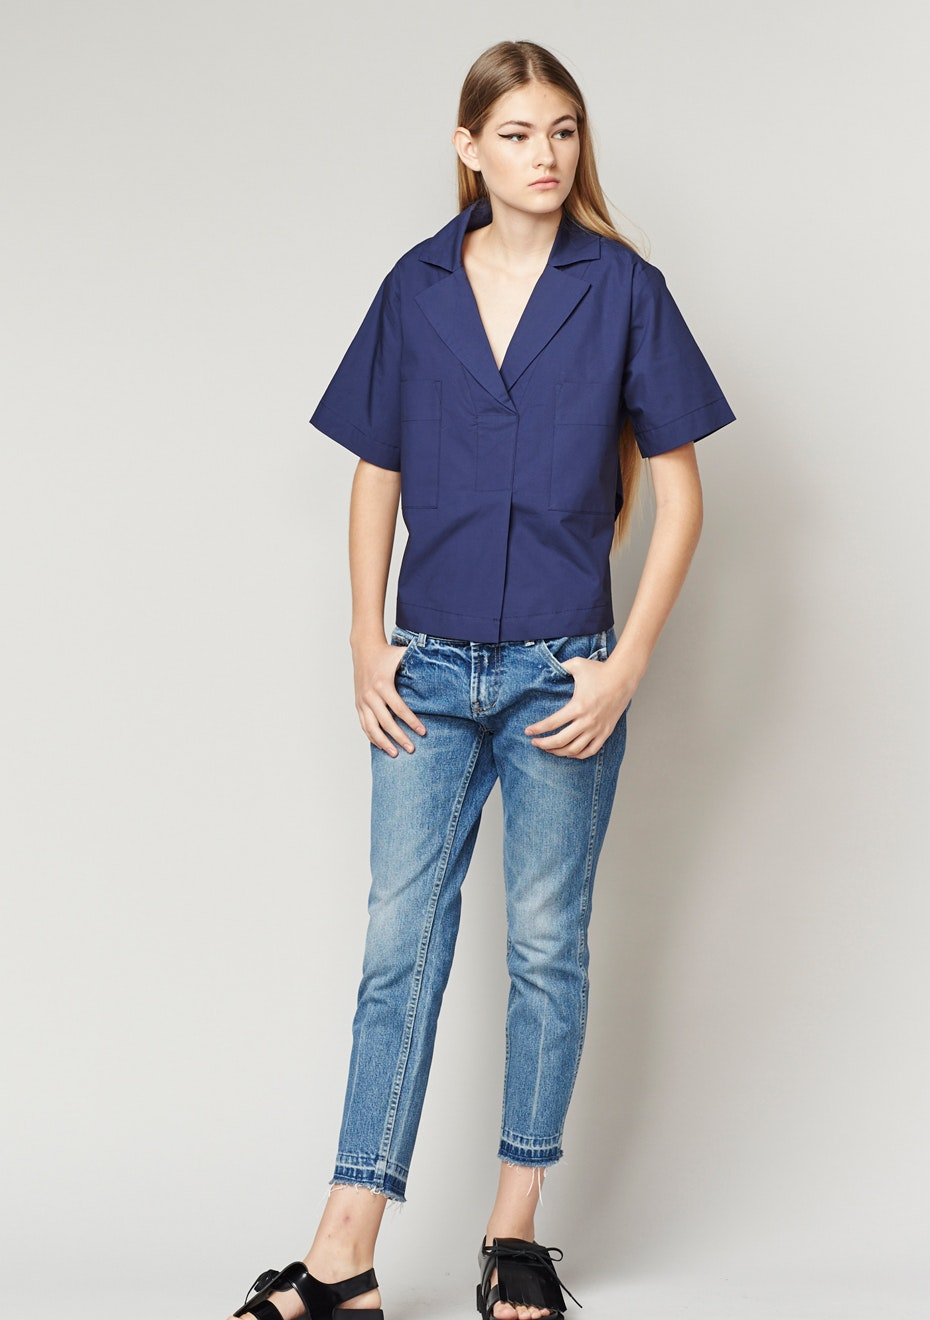 Achro - Short Sleeve Collared Shirts - Navy